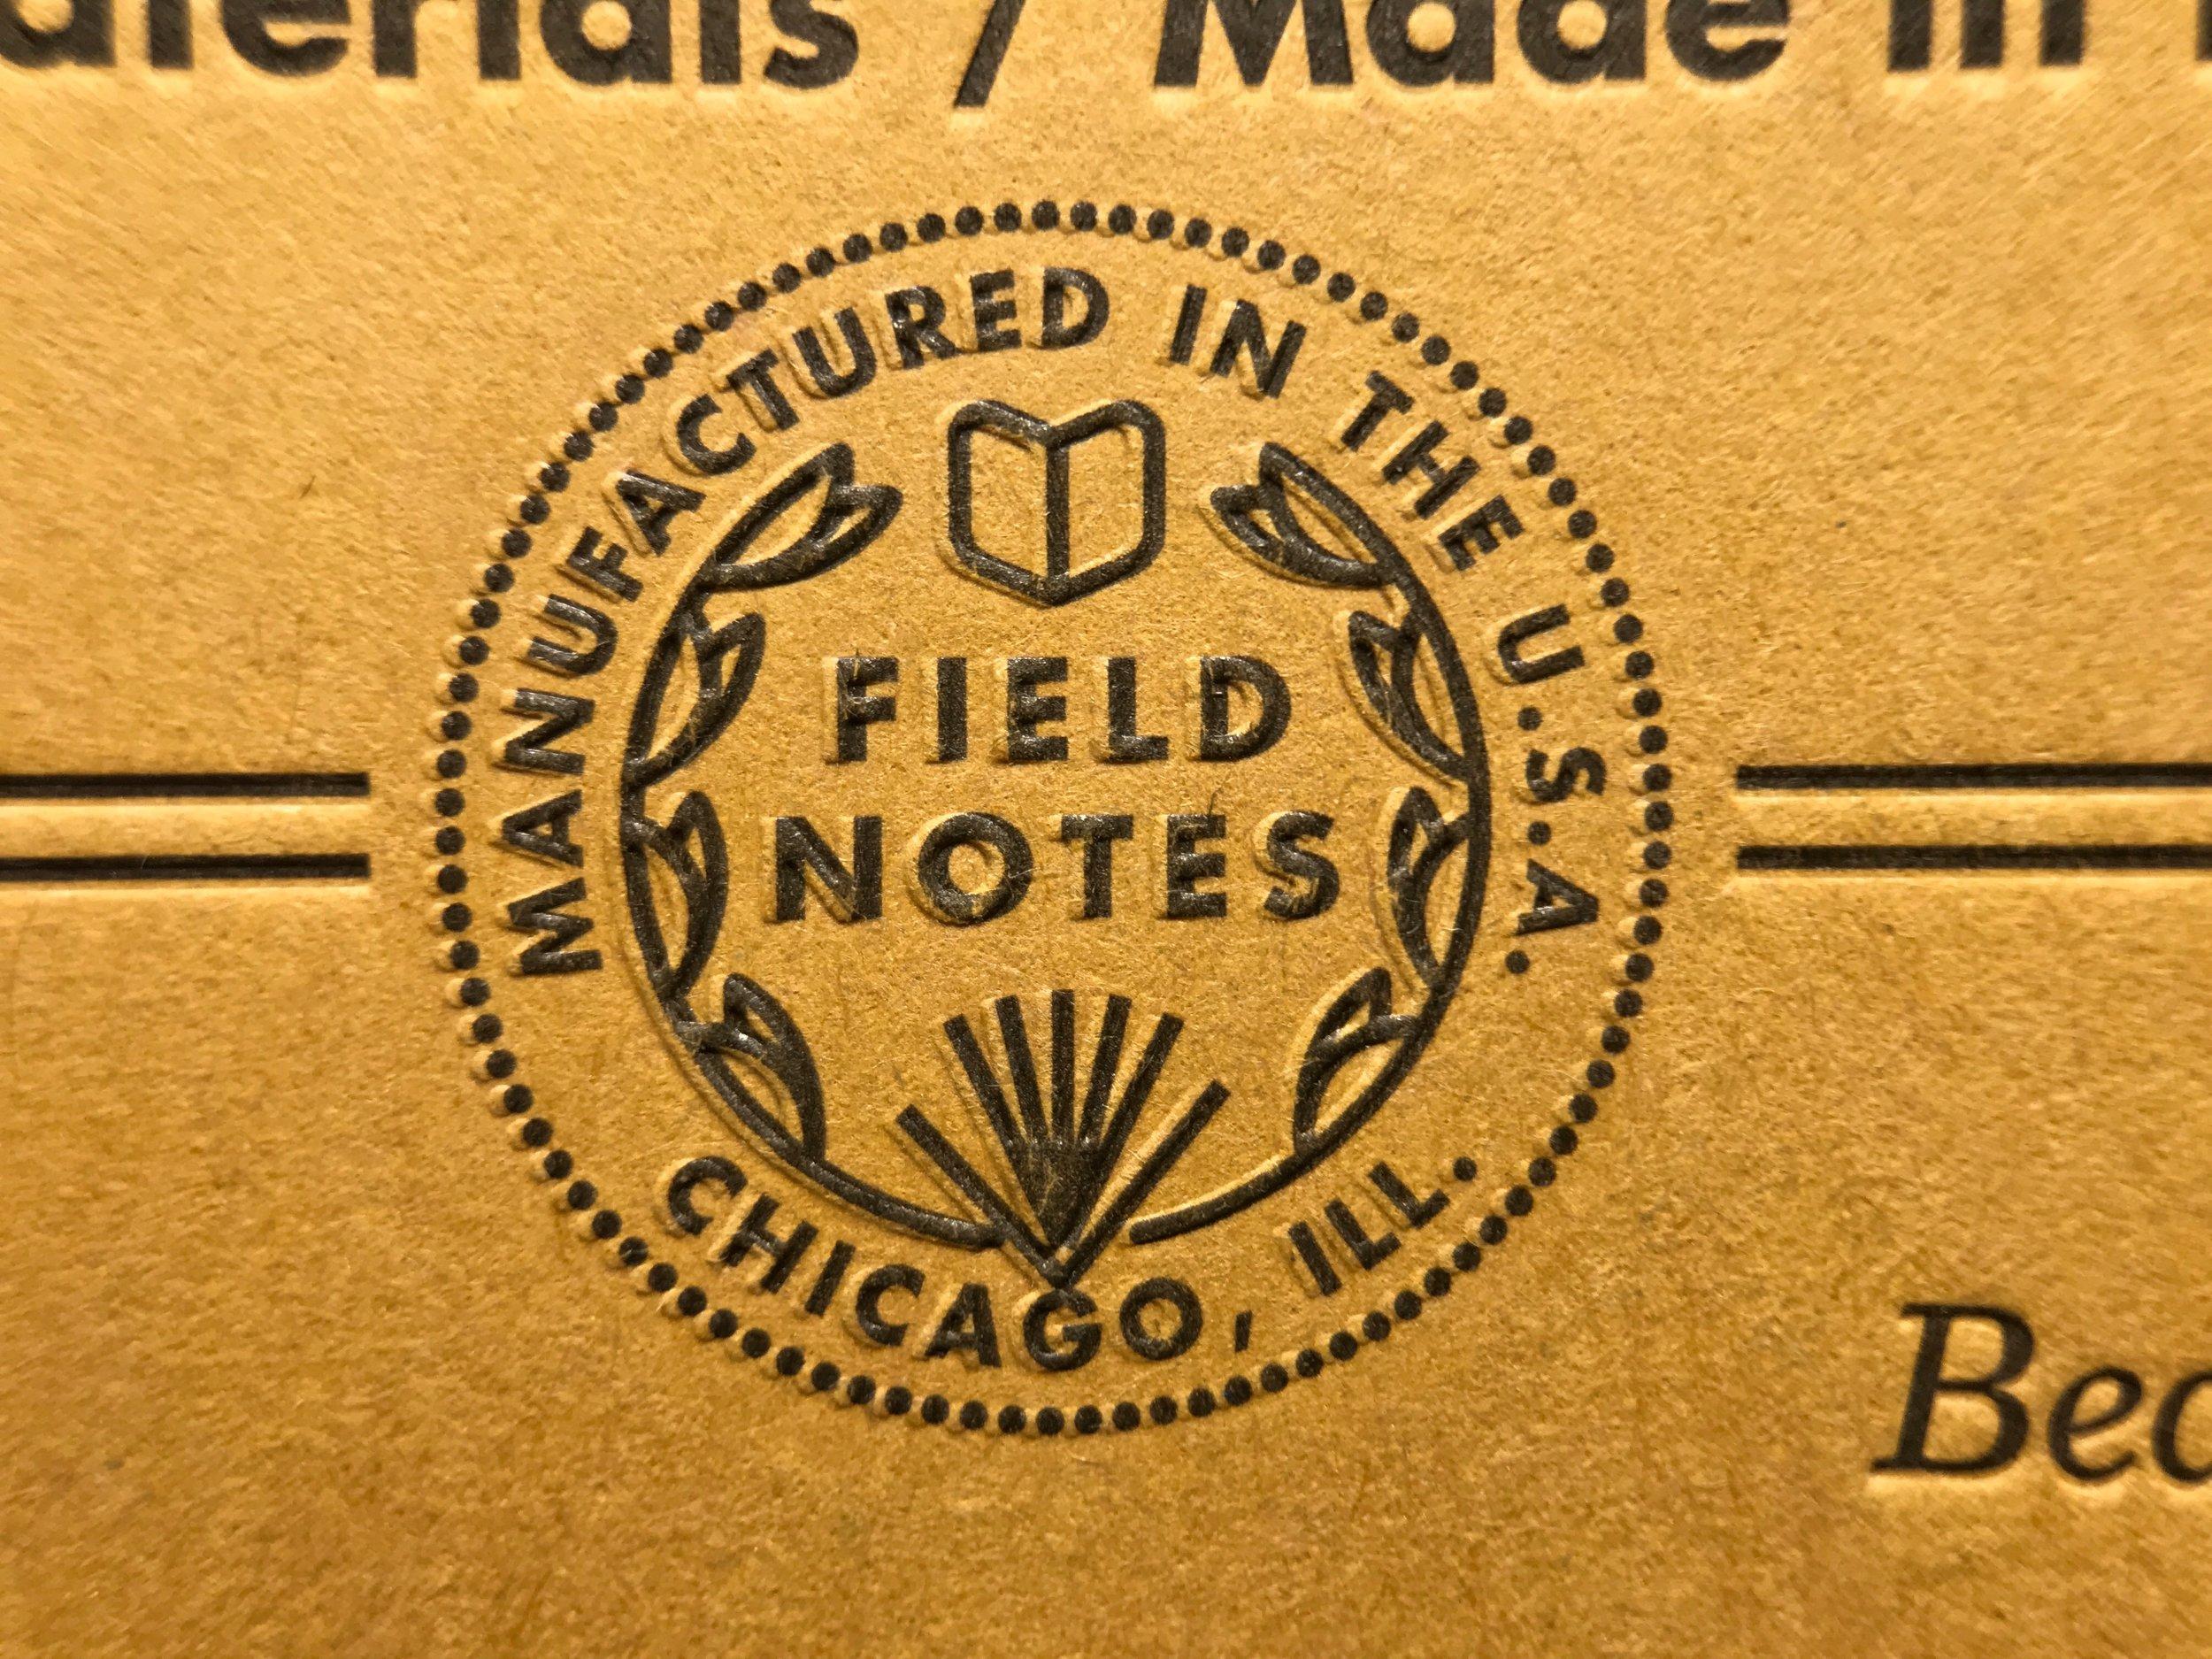 field-notes-dime-novel-7.jpg